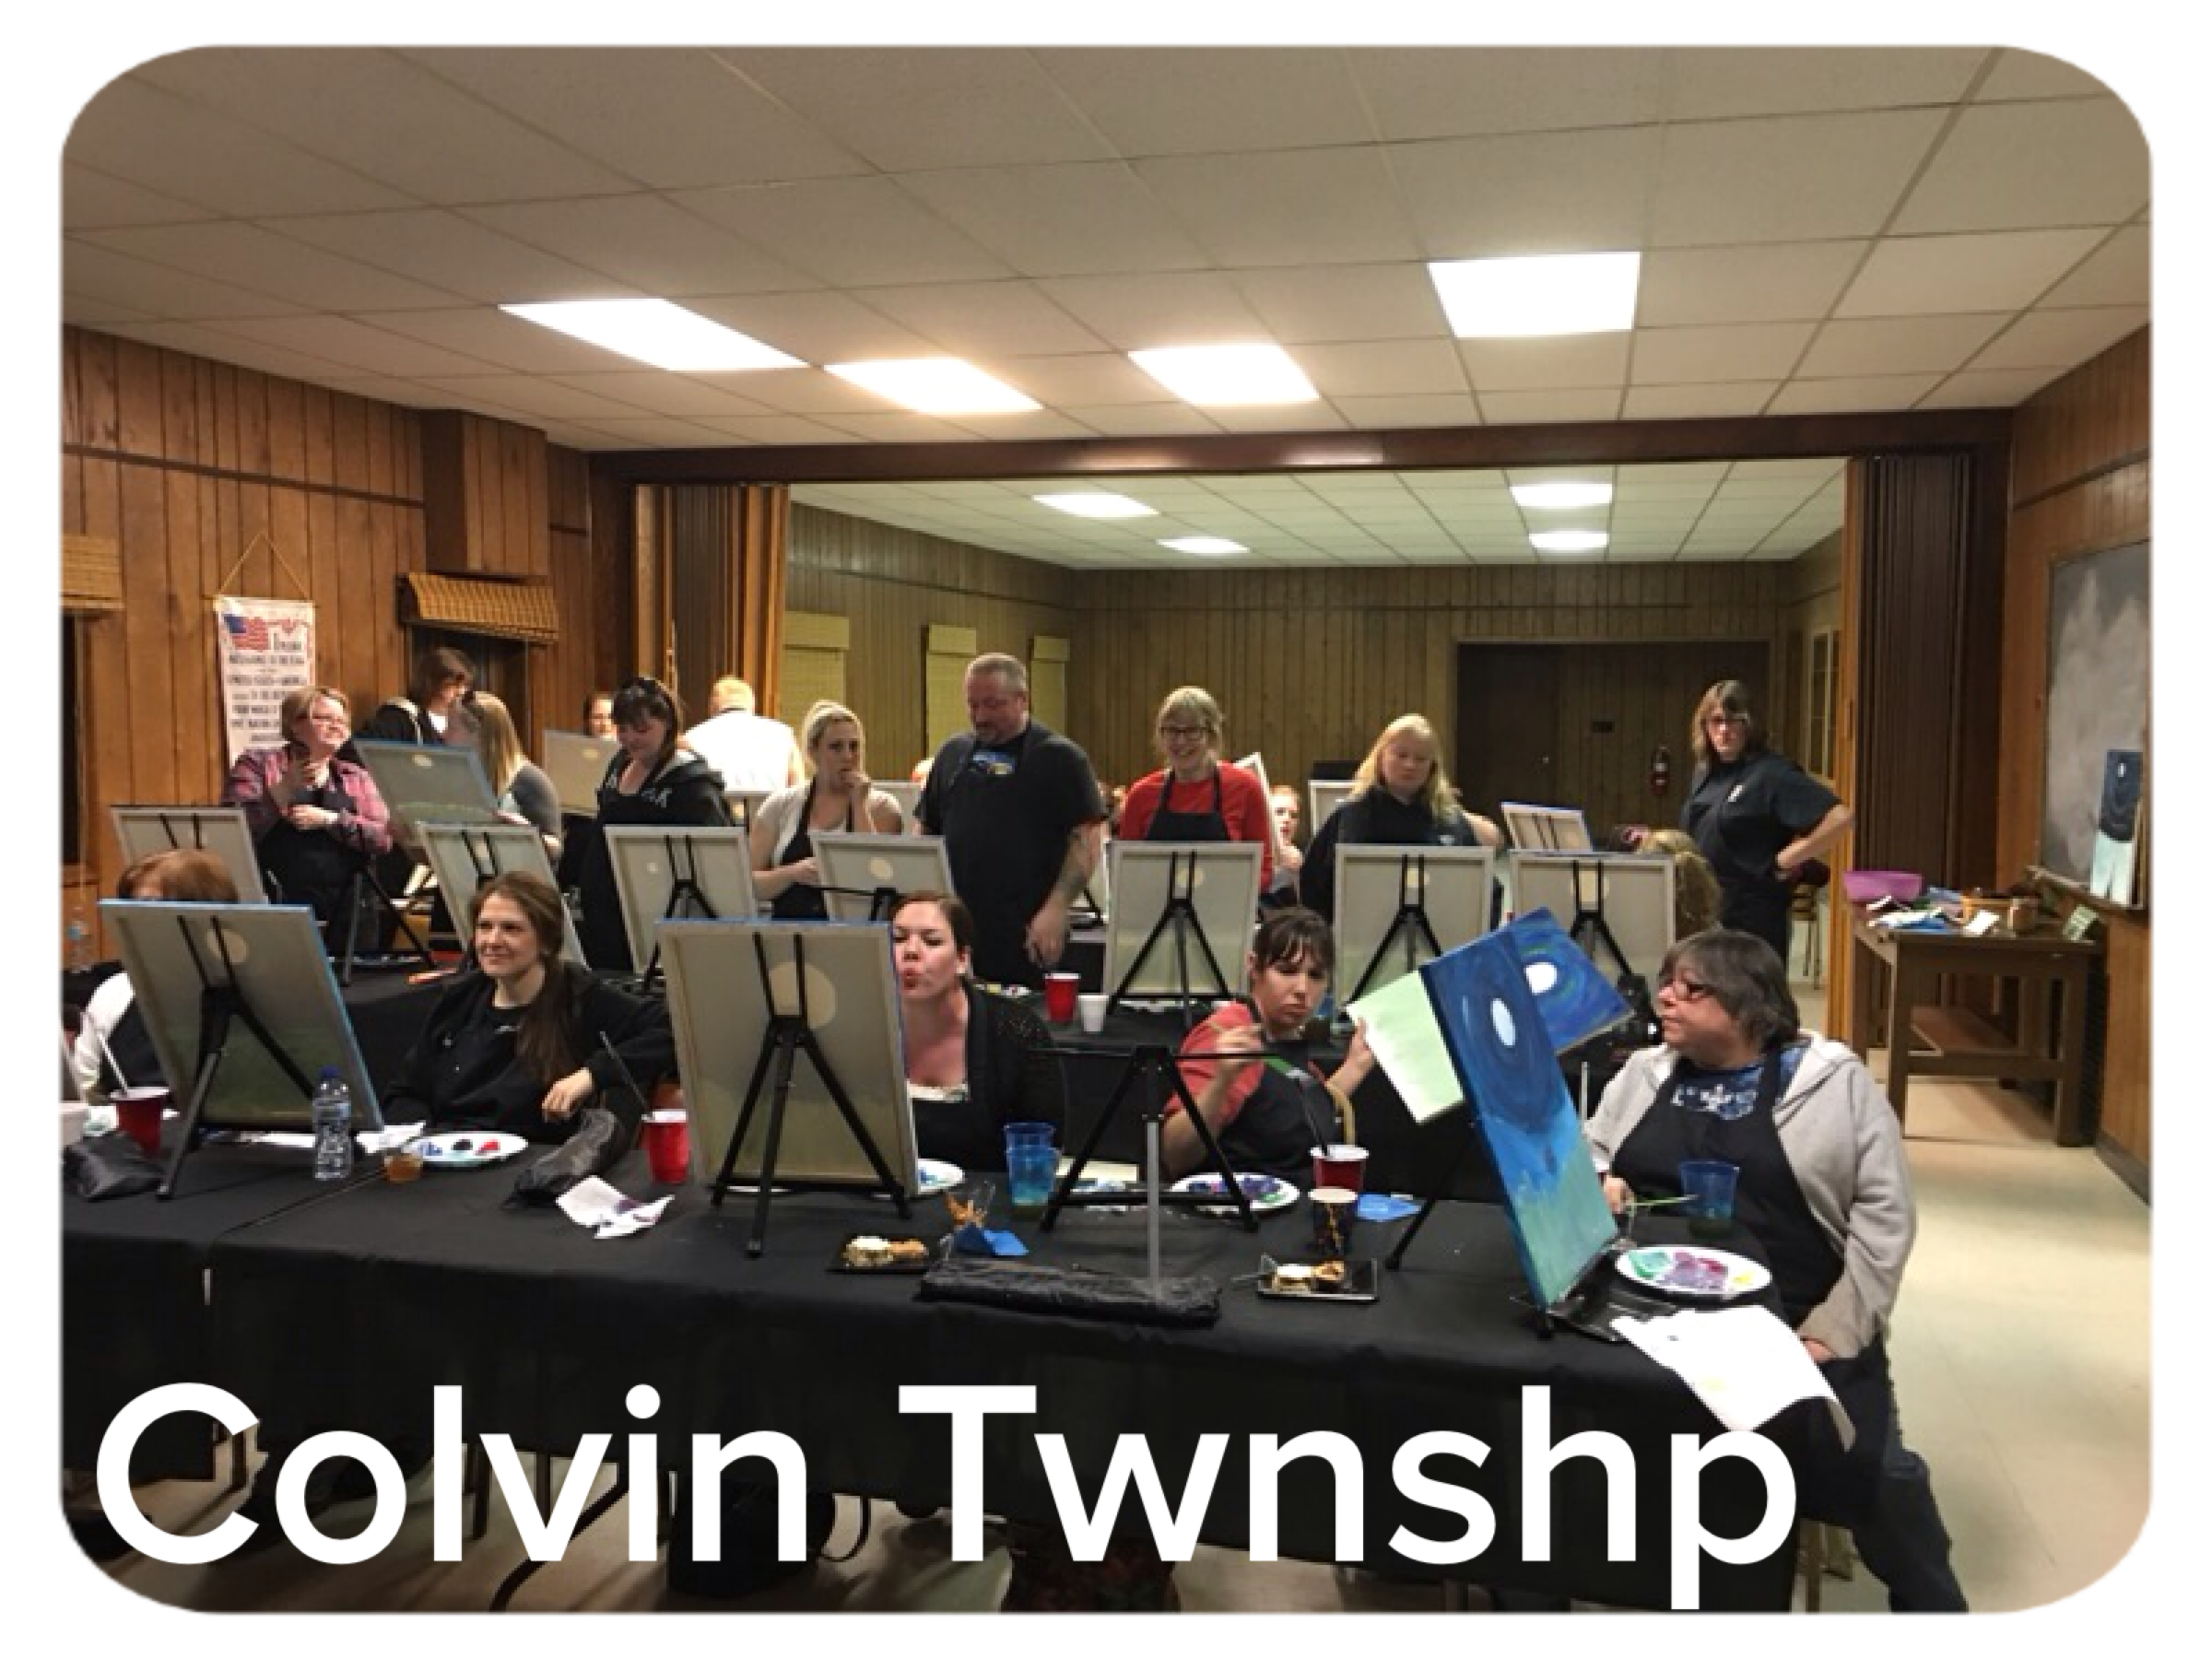 Private party Colvin Township